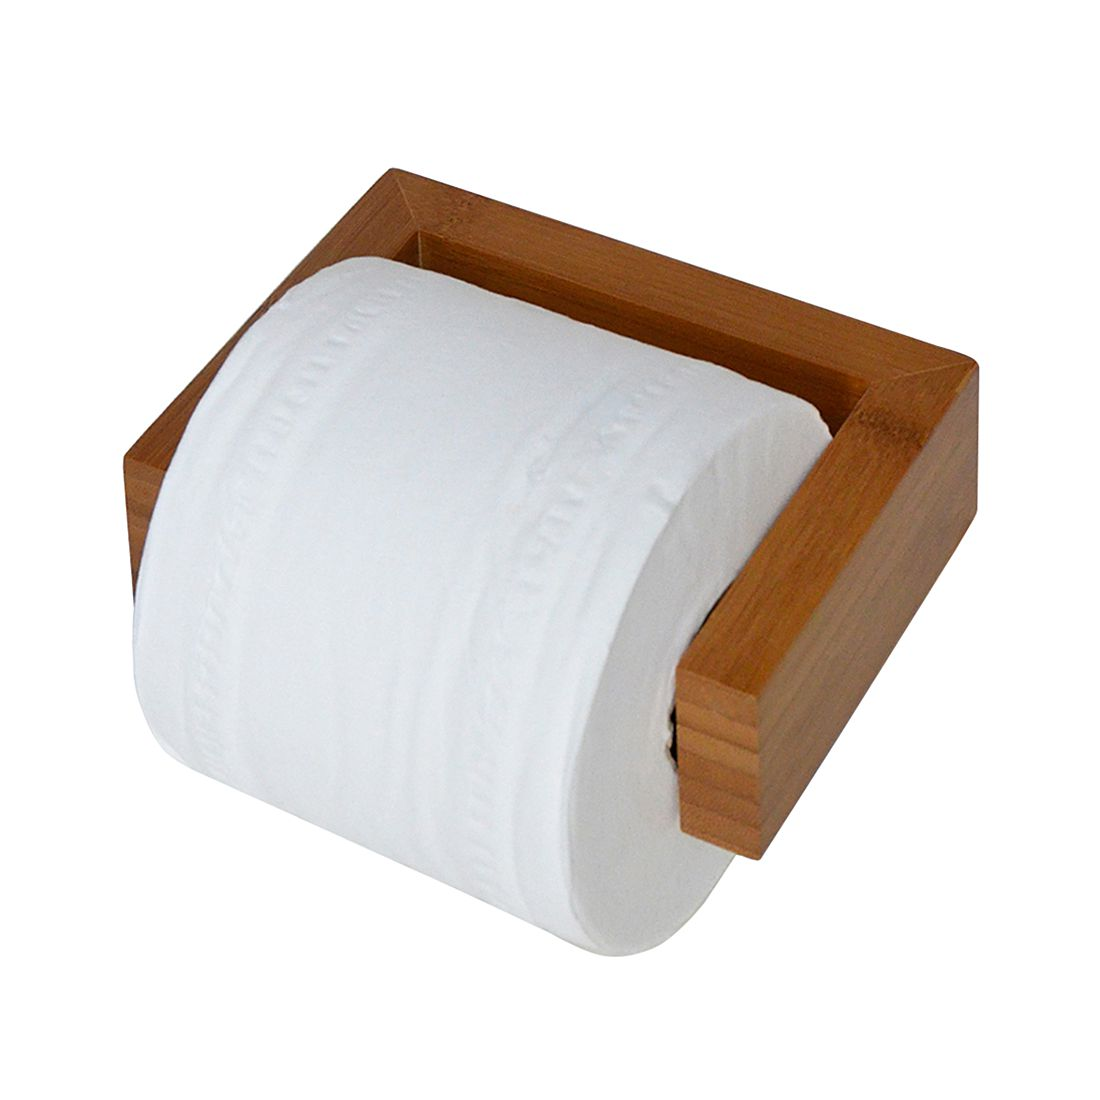 Toilettenpapierhalter Arena - Bambus, Wireworks